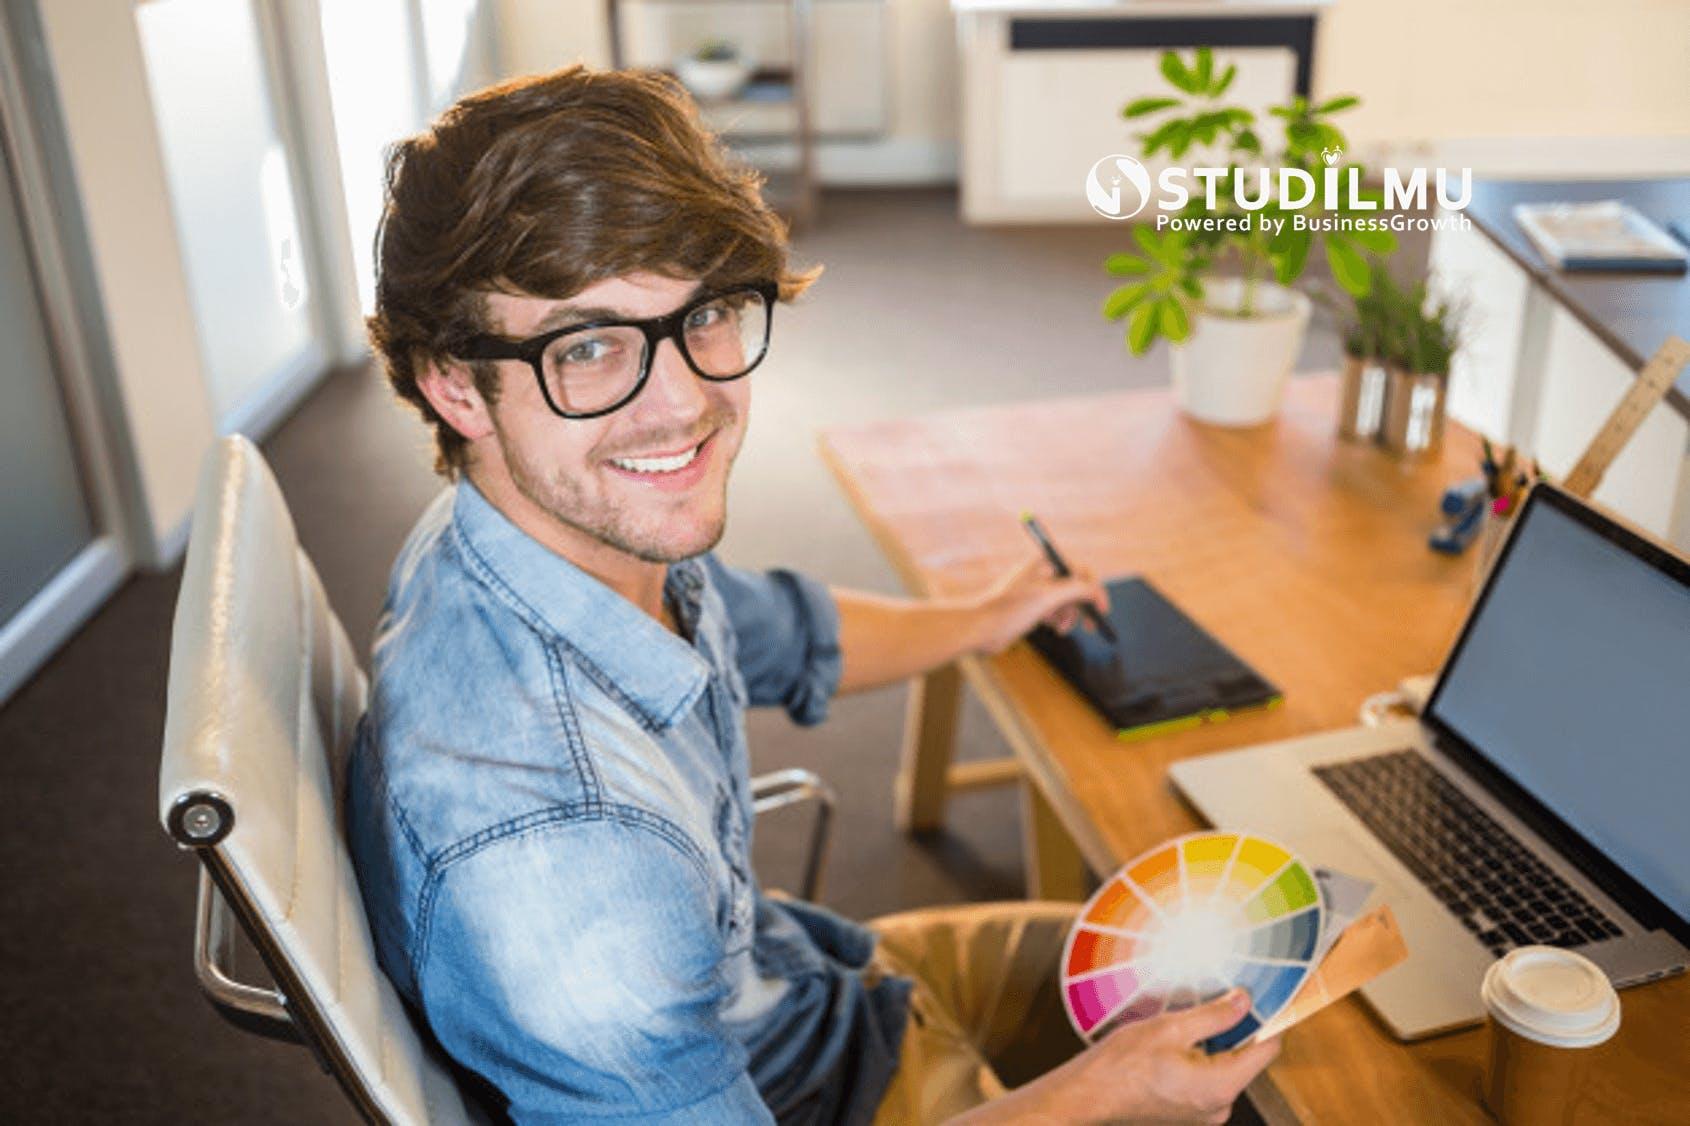 STUDILMU Career Advice - 3 Cara Ampuh Meningkatkan Produktivitas Kerja dan Kebahagiaan